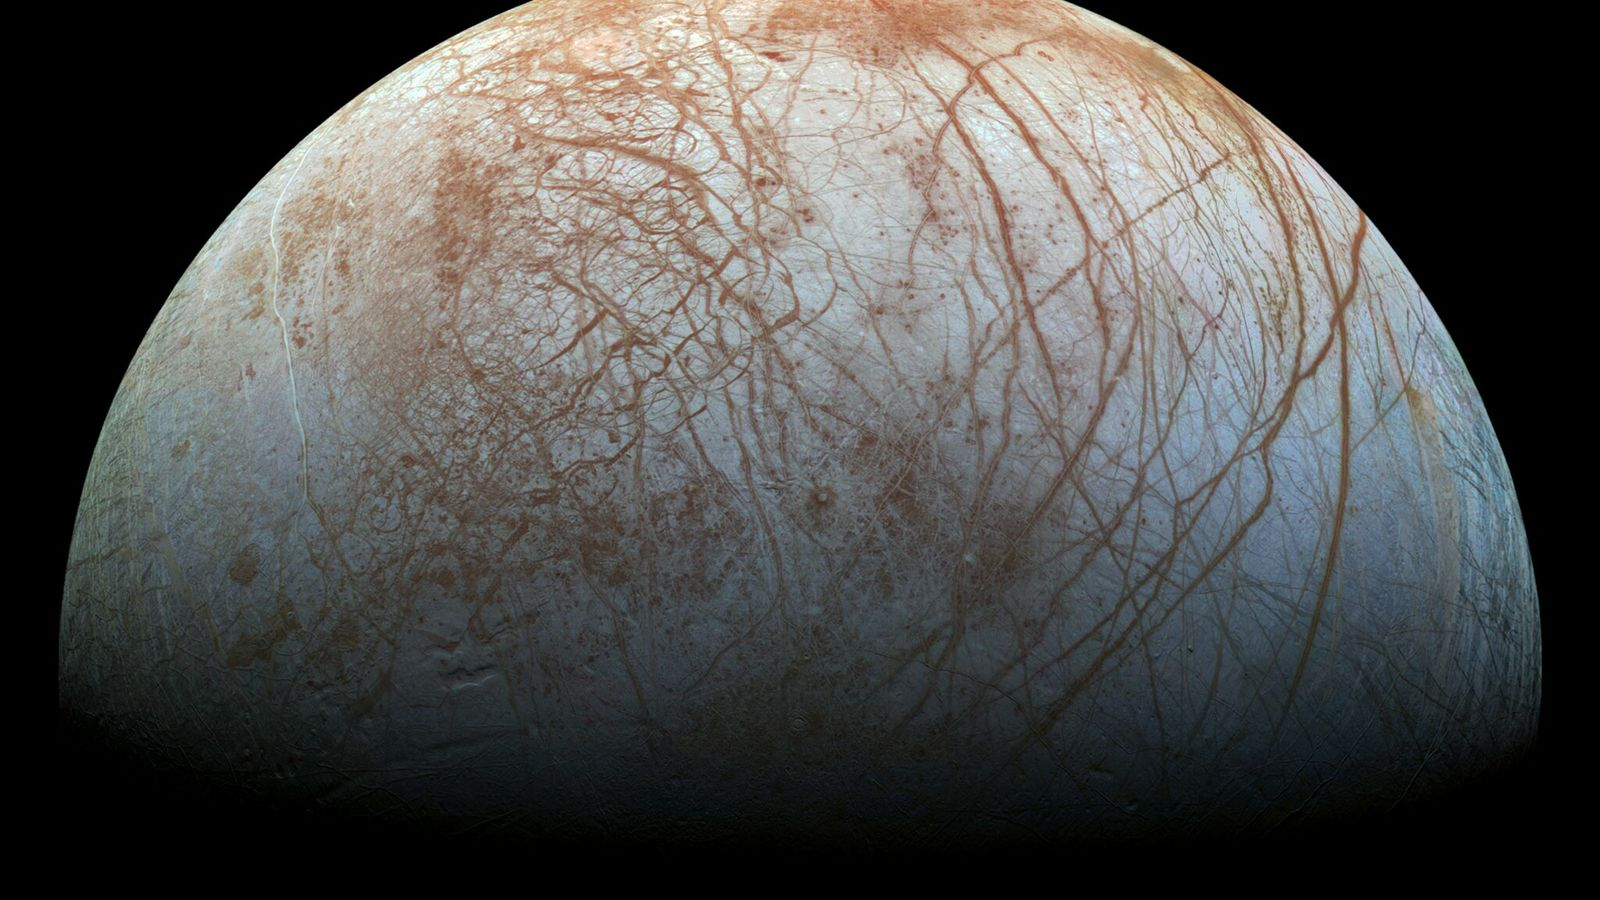 Jupiter-Mond Europa